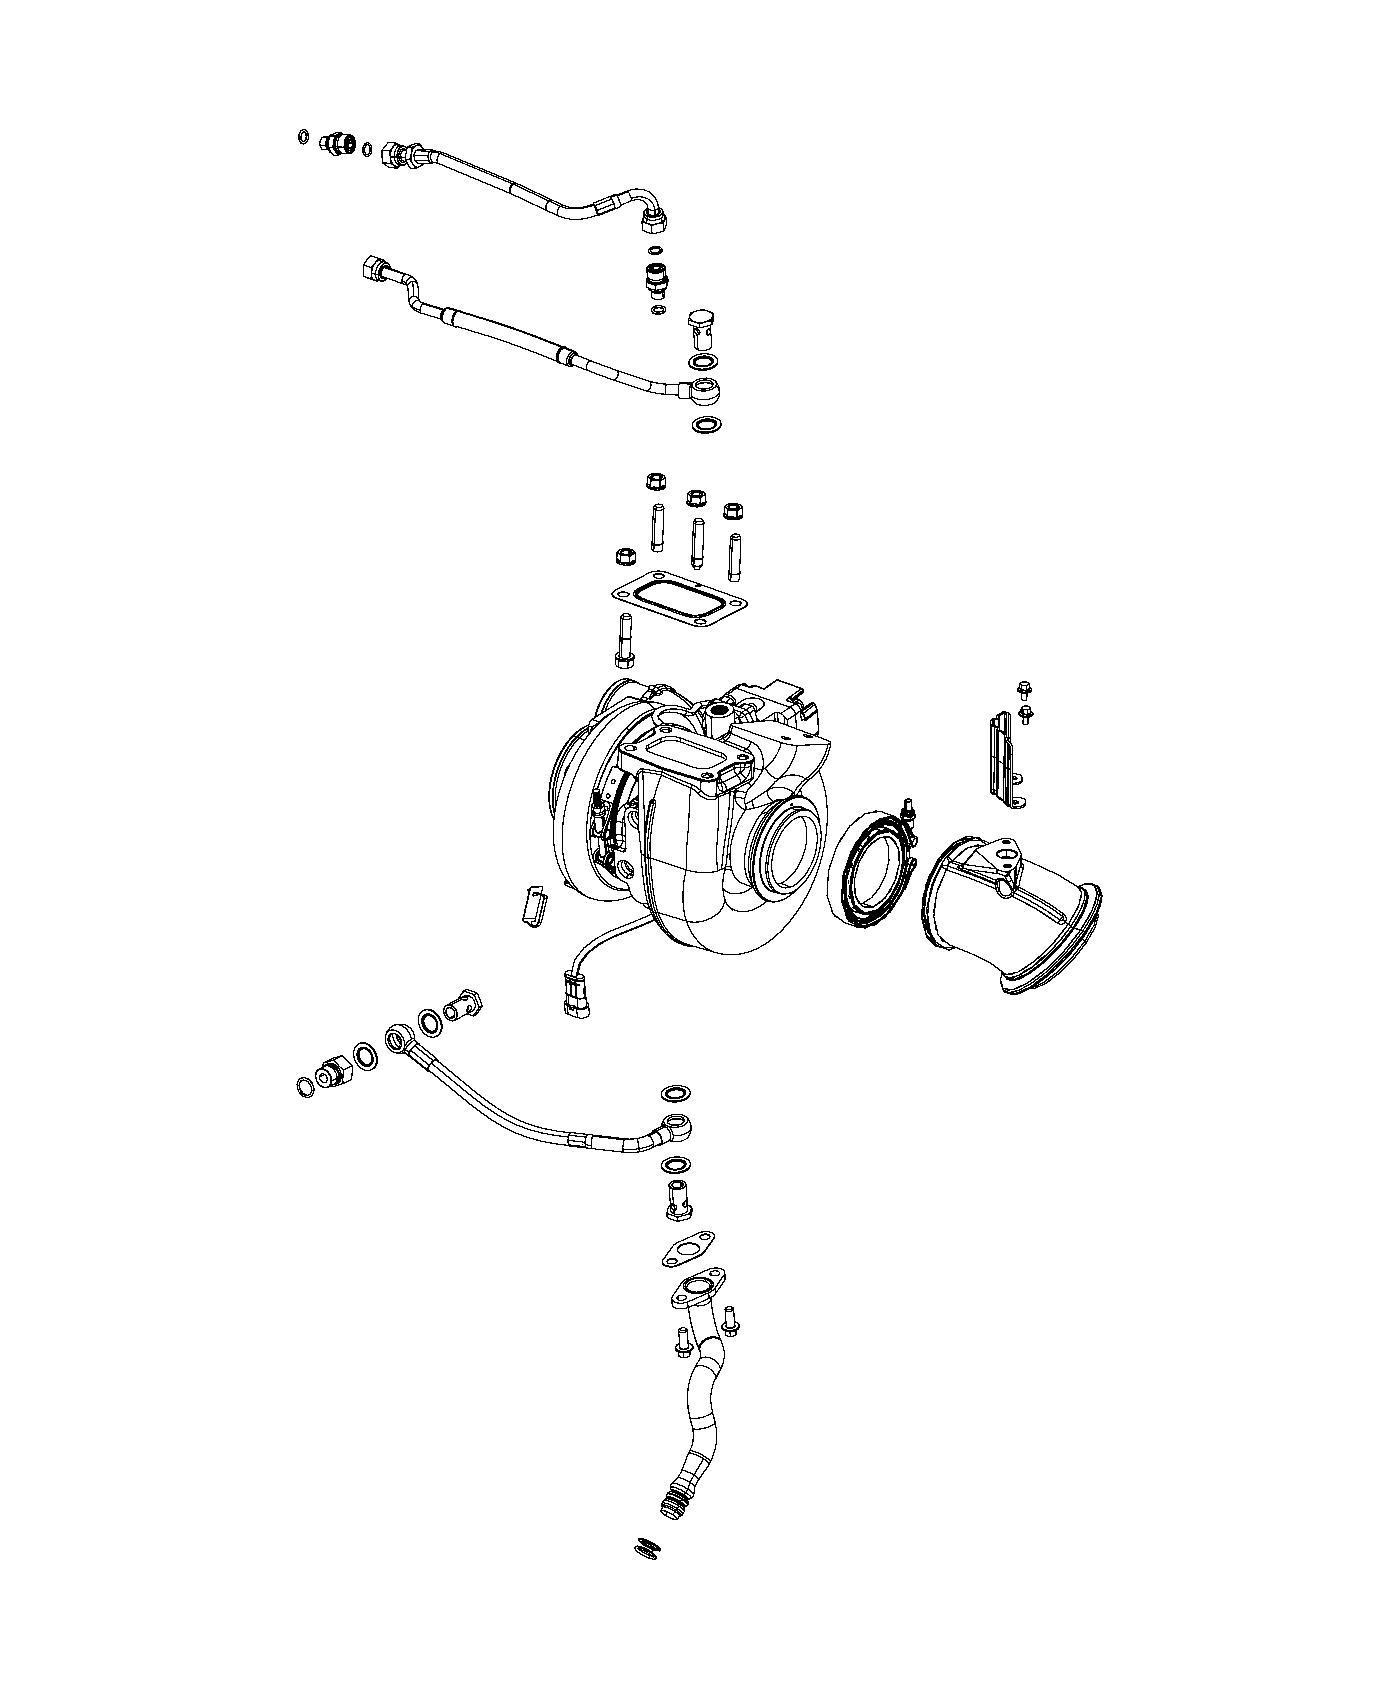 2015 Ram 3500 Turbocharger. Diesel, emissions, lines